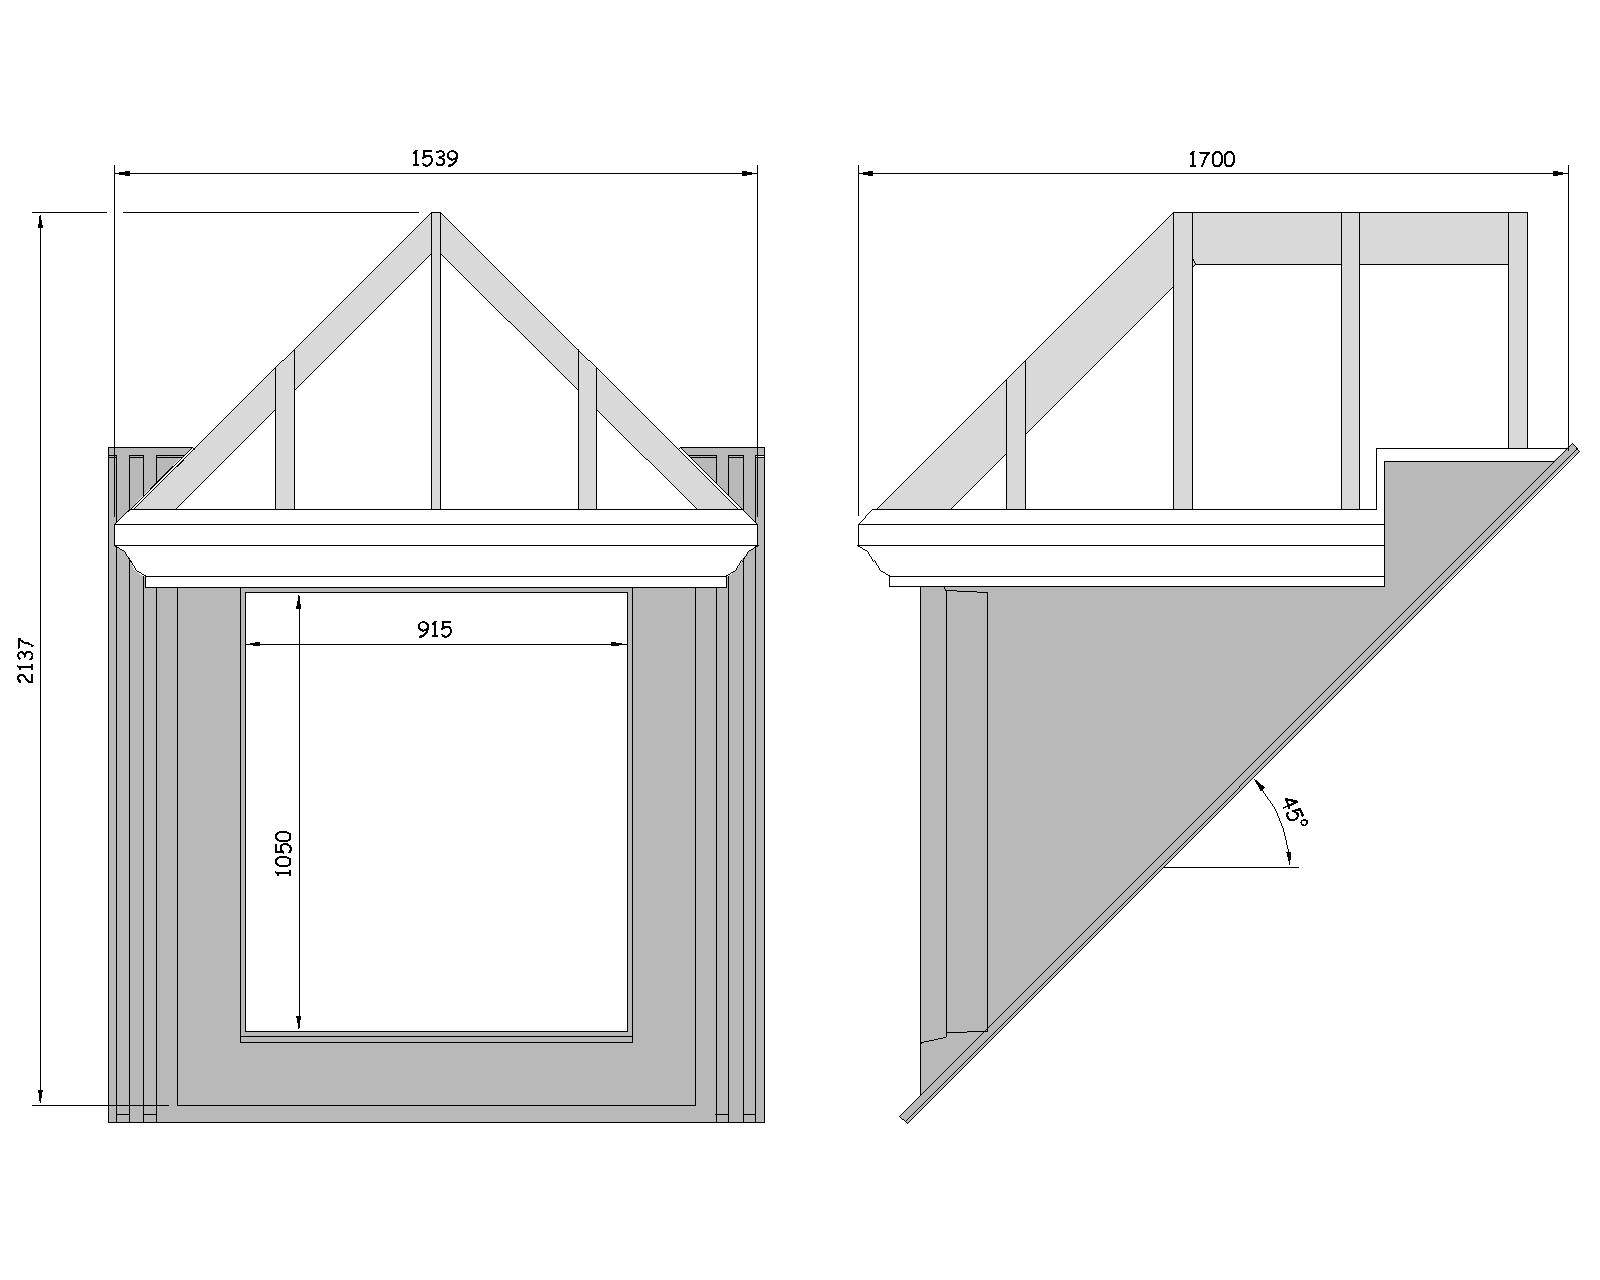 Fibreglass Grp Dormer Trussed Roof Dormers Uk